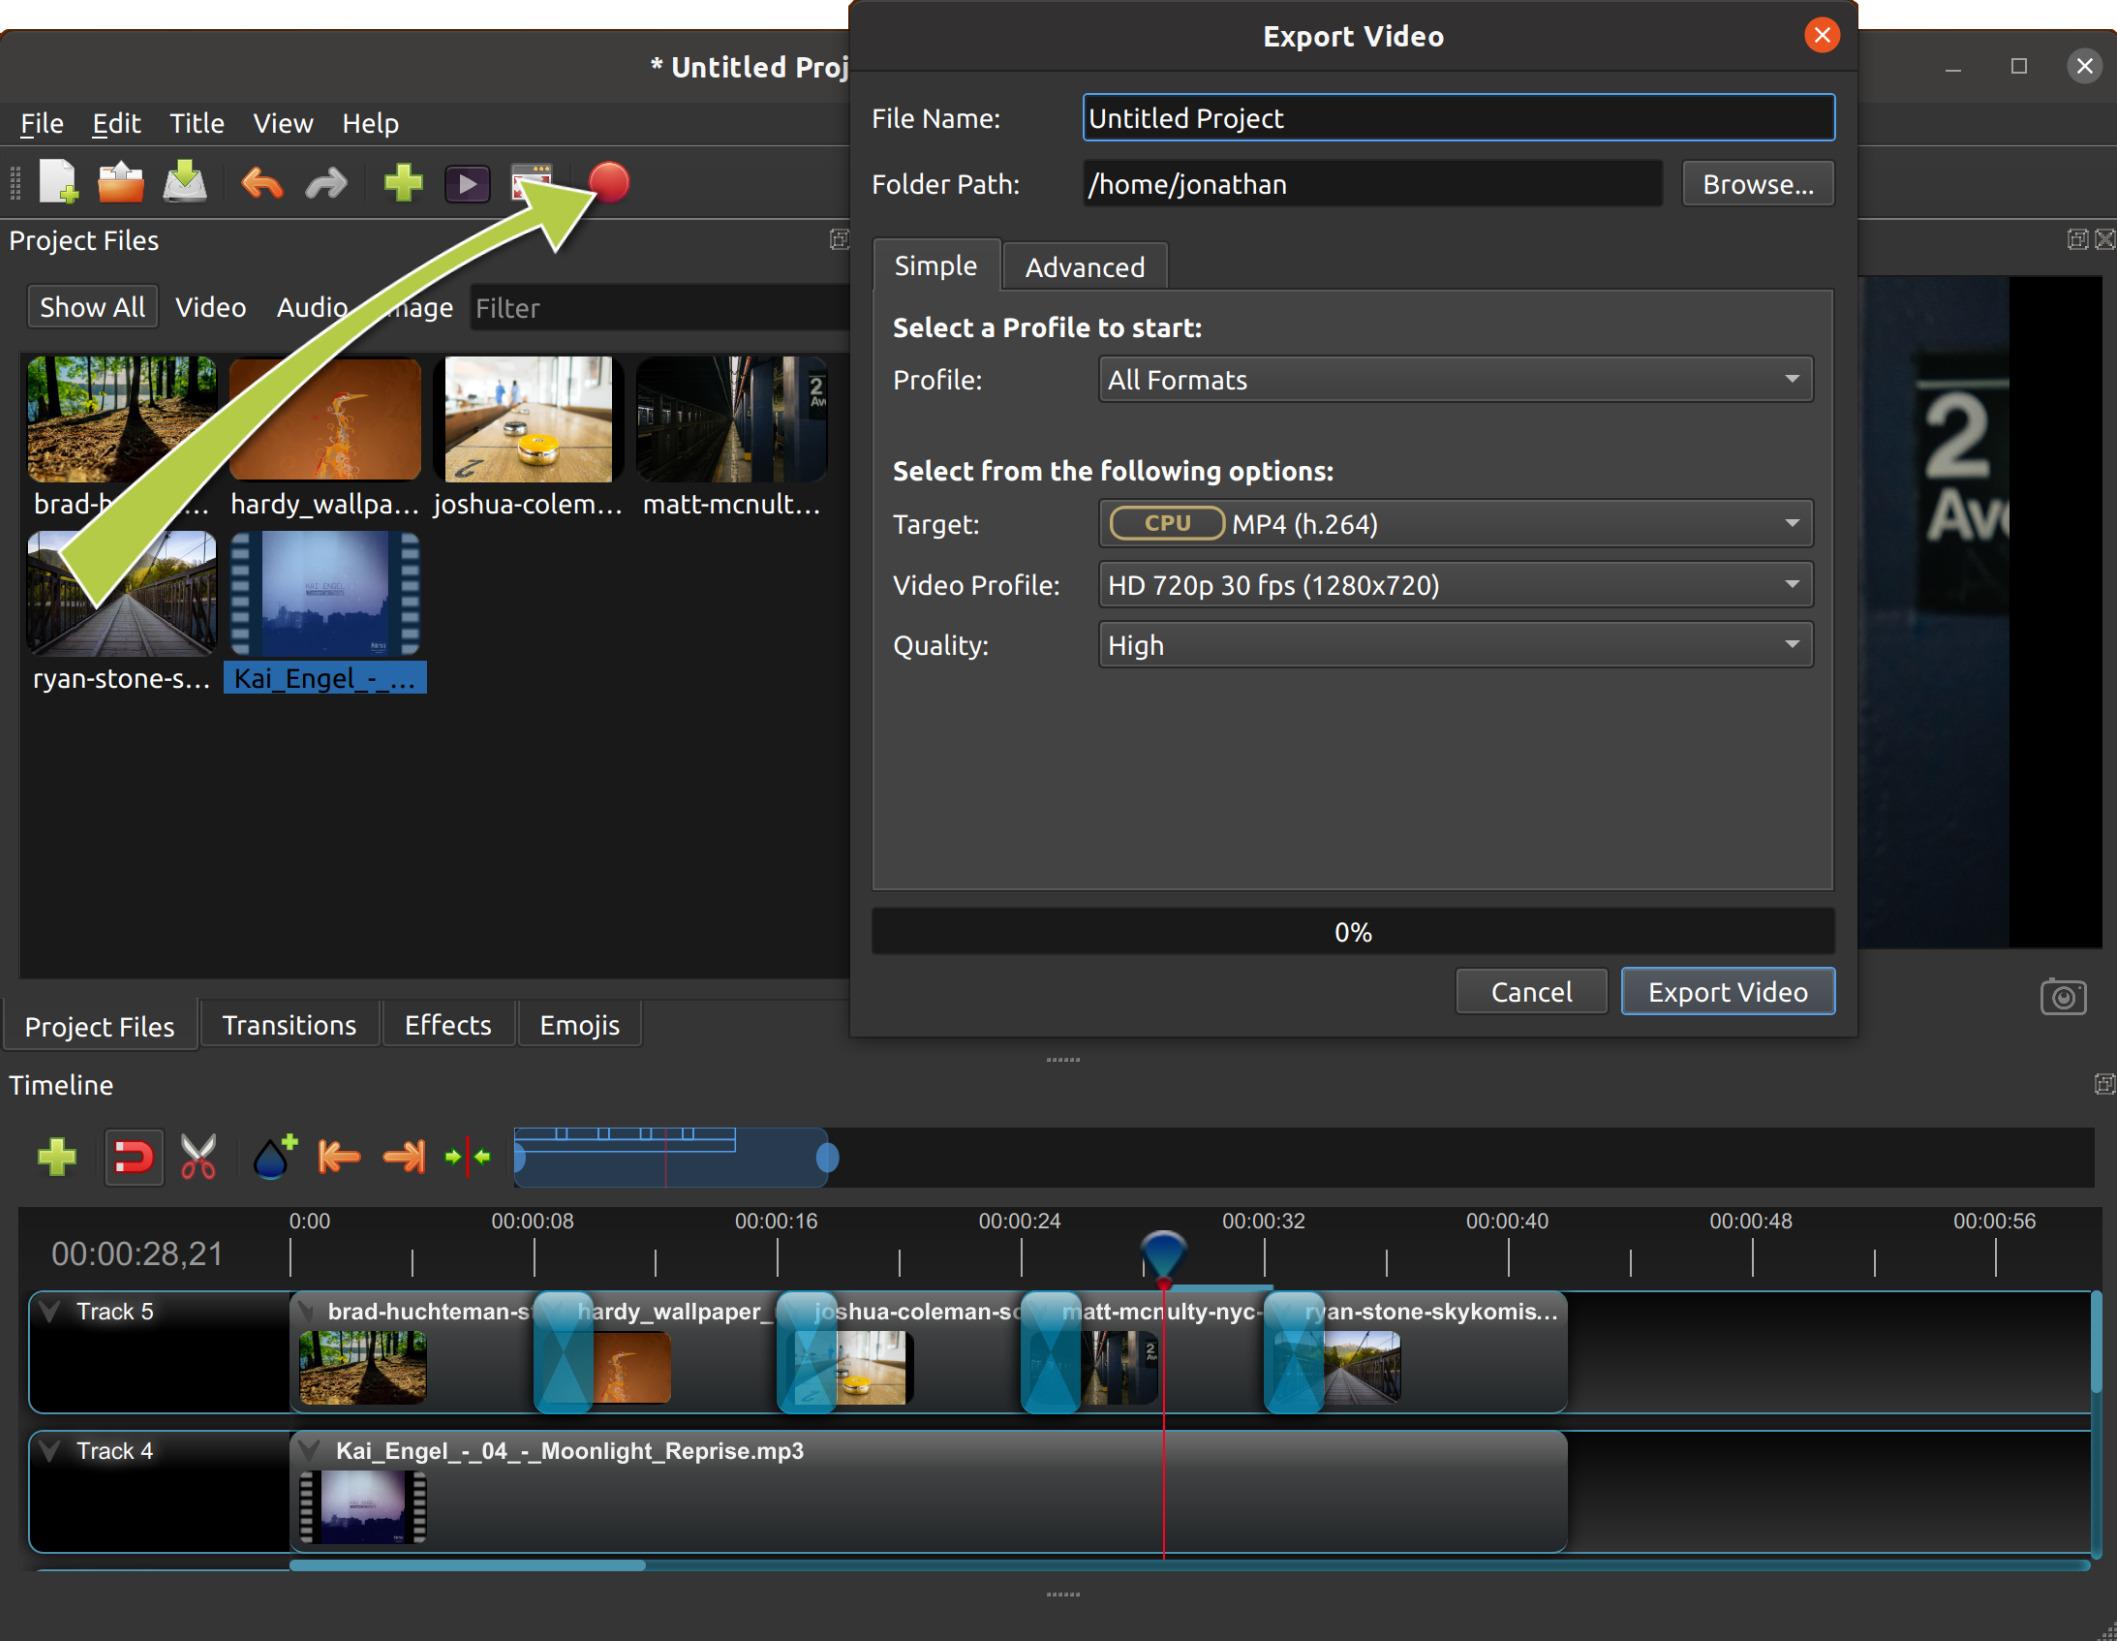 Quick Tutorial — OpenShot Video Editor 2 4 1-dev1 documentation